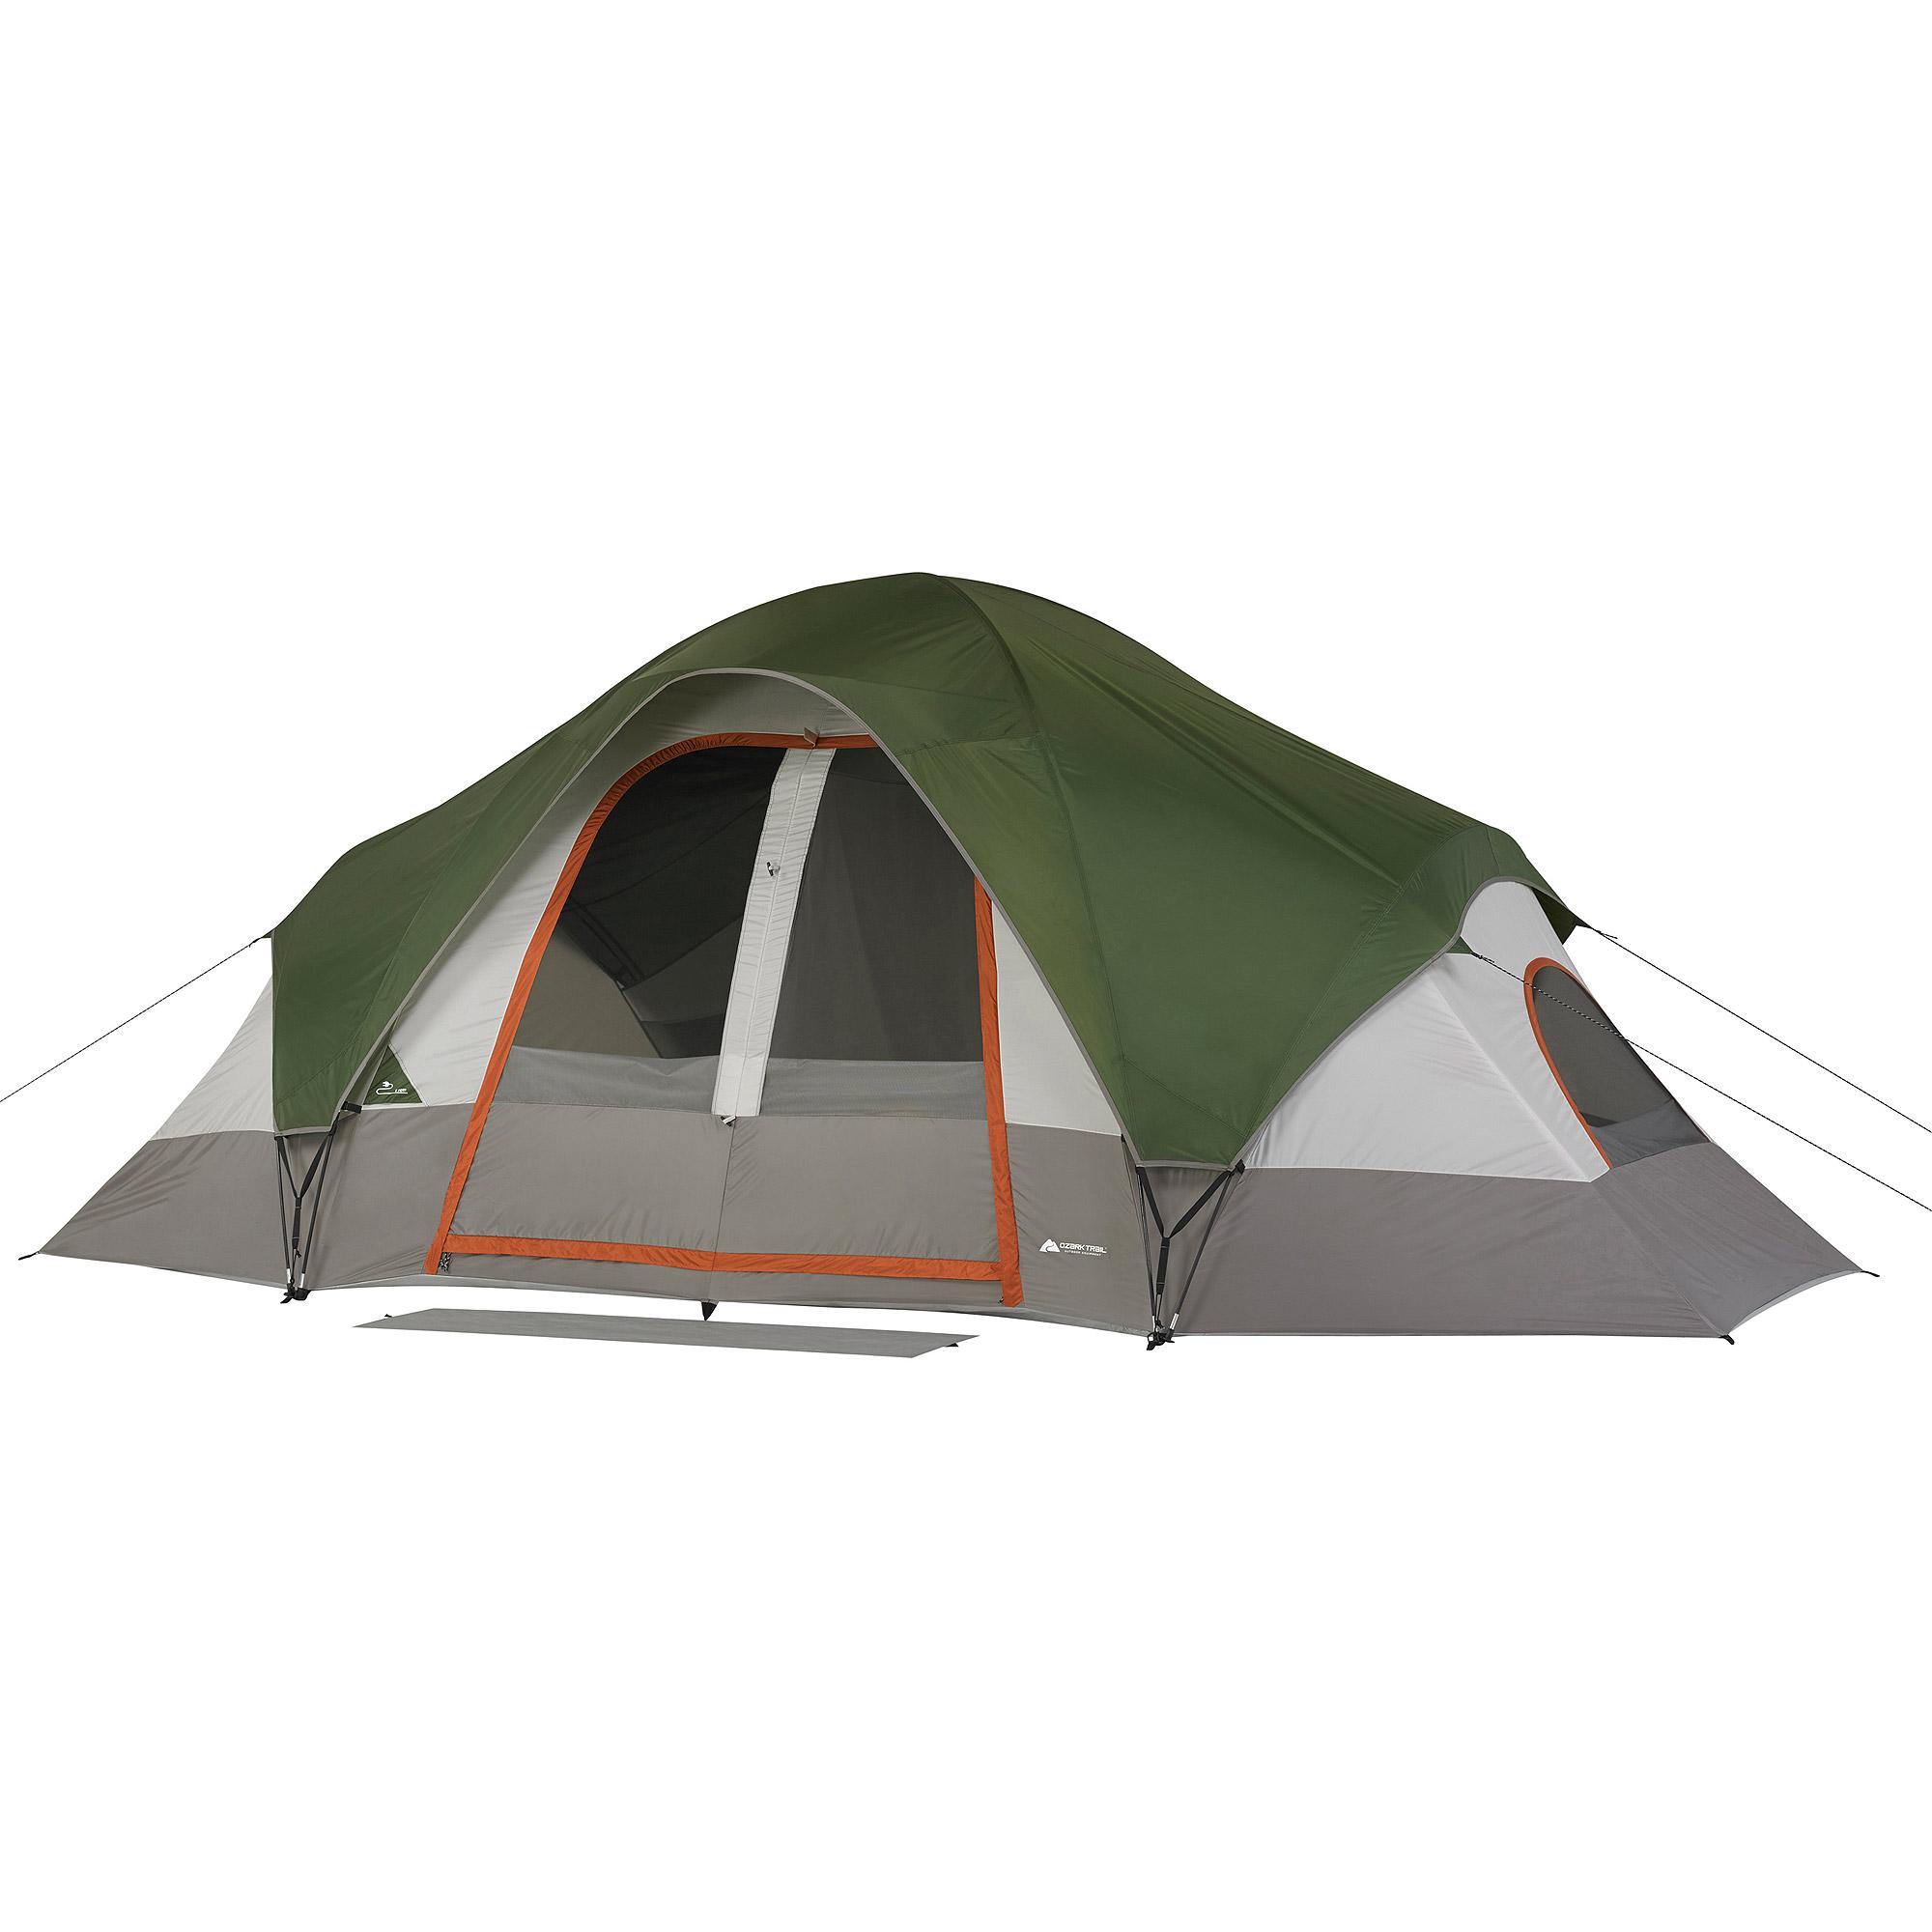 Ozark Trail 16' x 8' Eight-Person Tent, Green